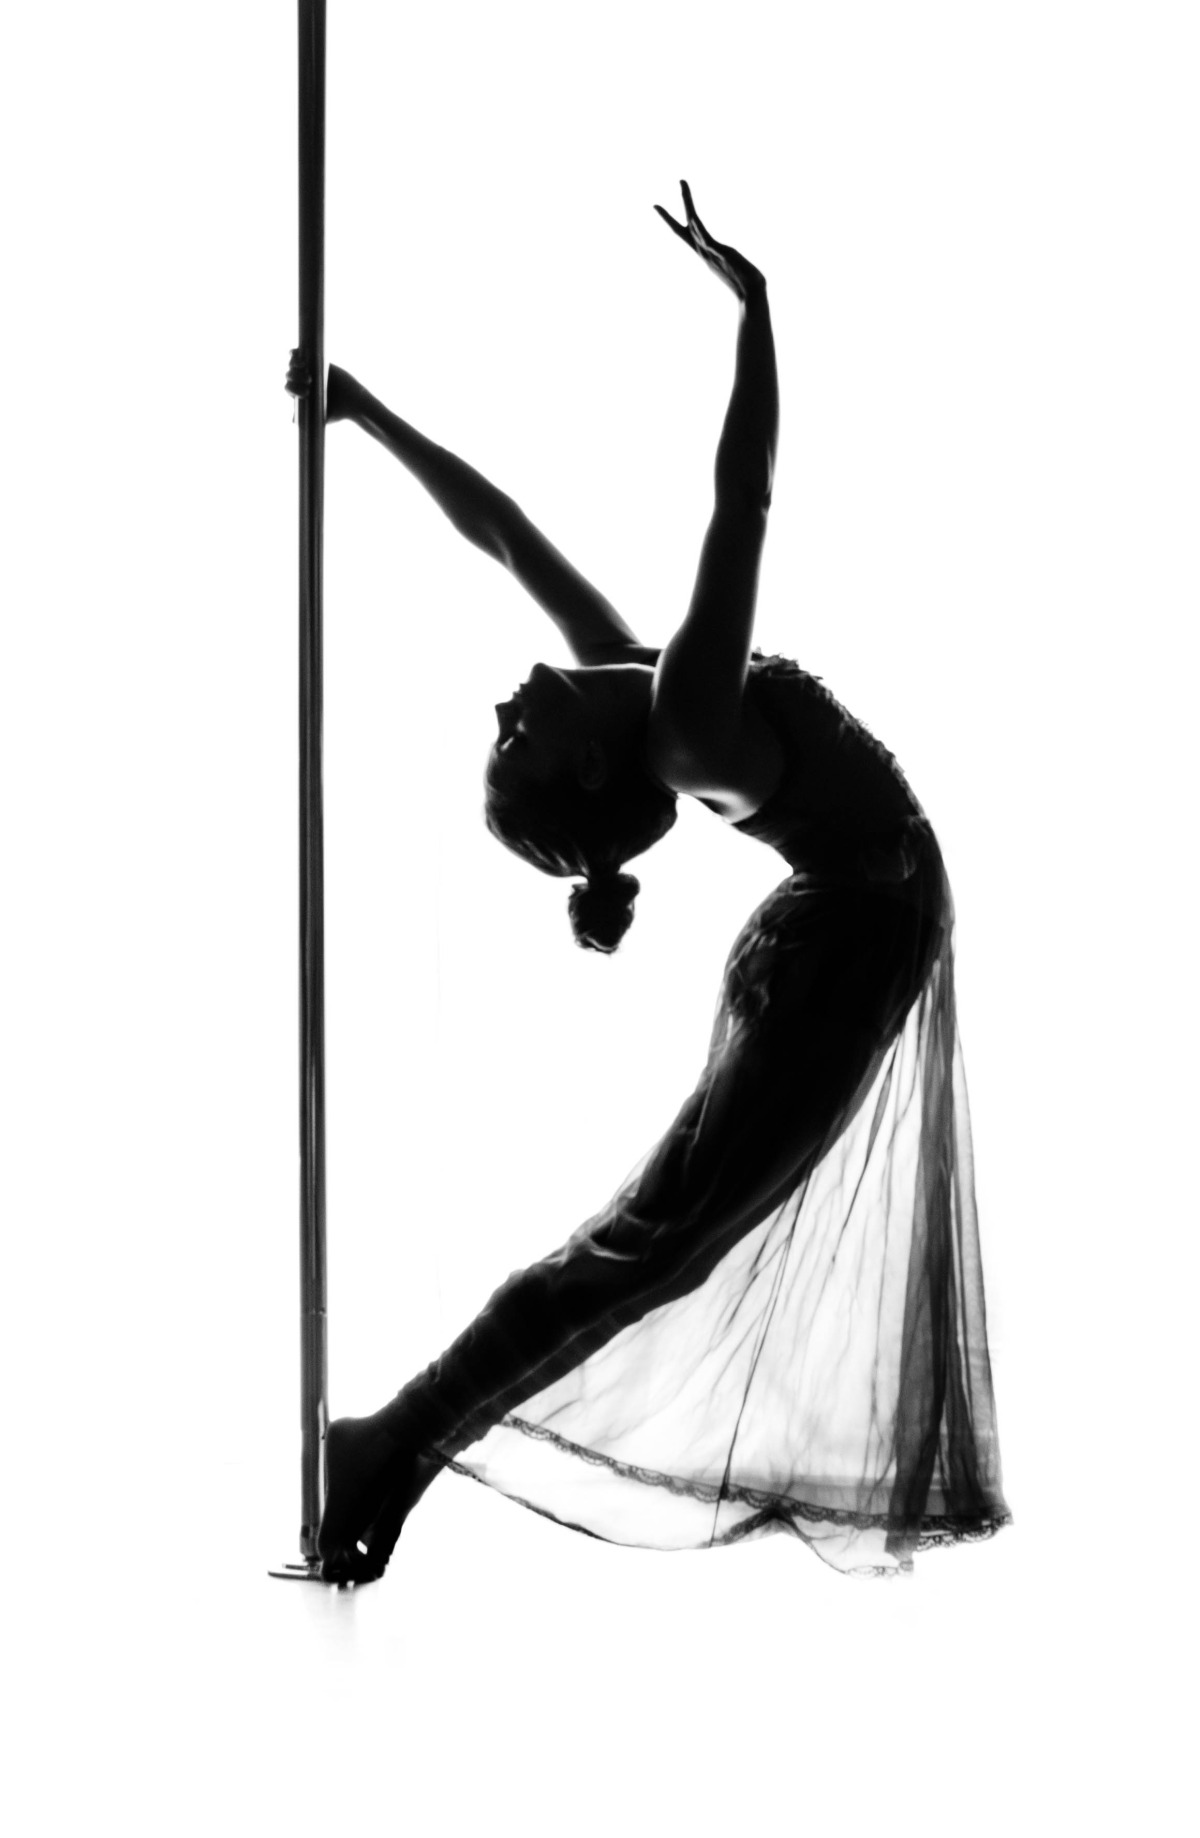 0 dancemove with pole backbend.jpg